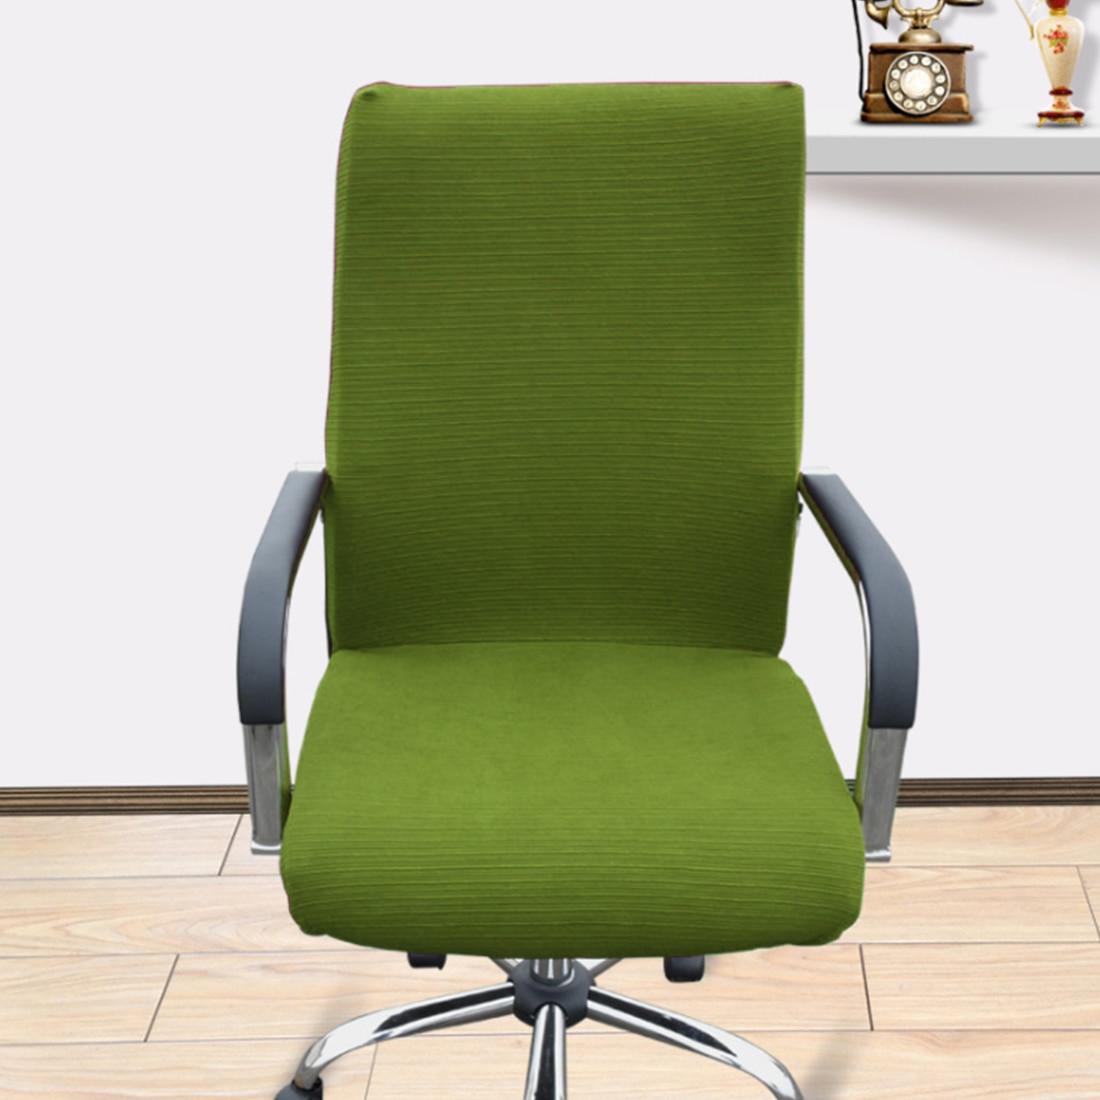 Unique Cloth Computer Chairs